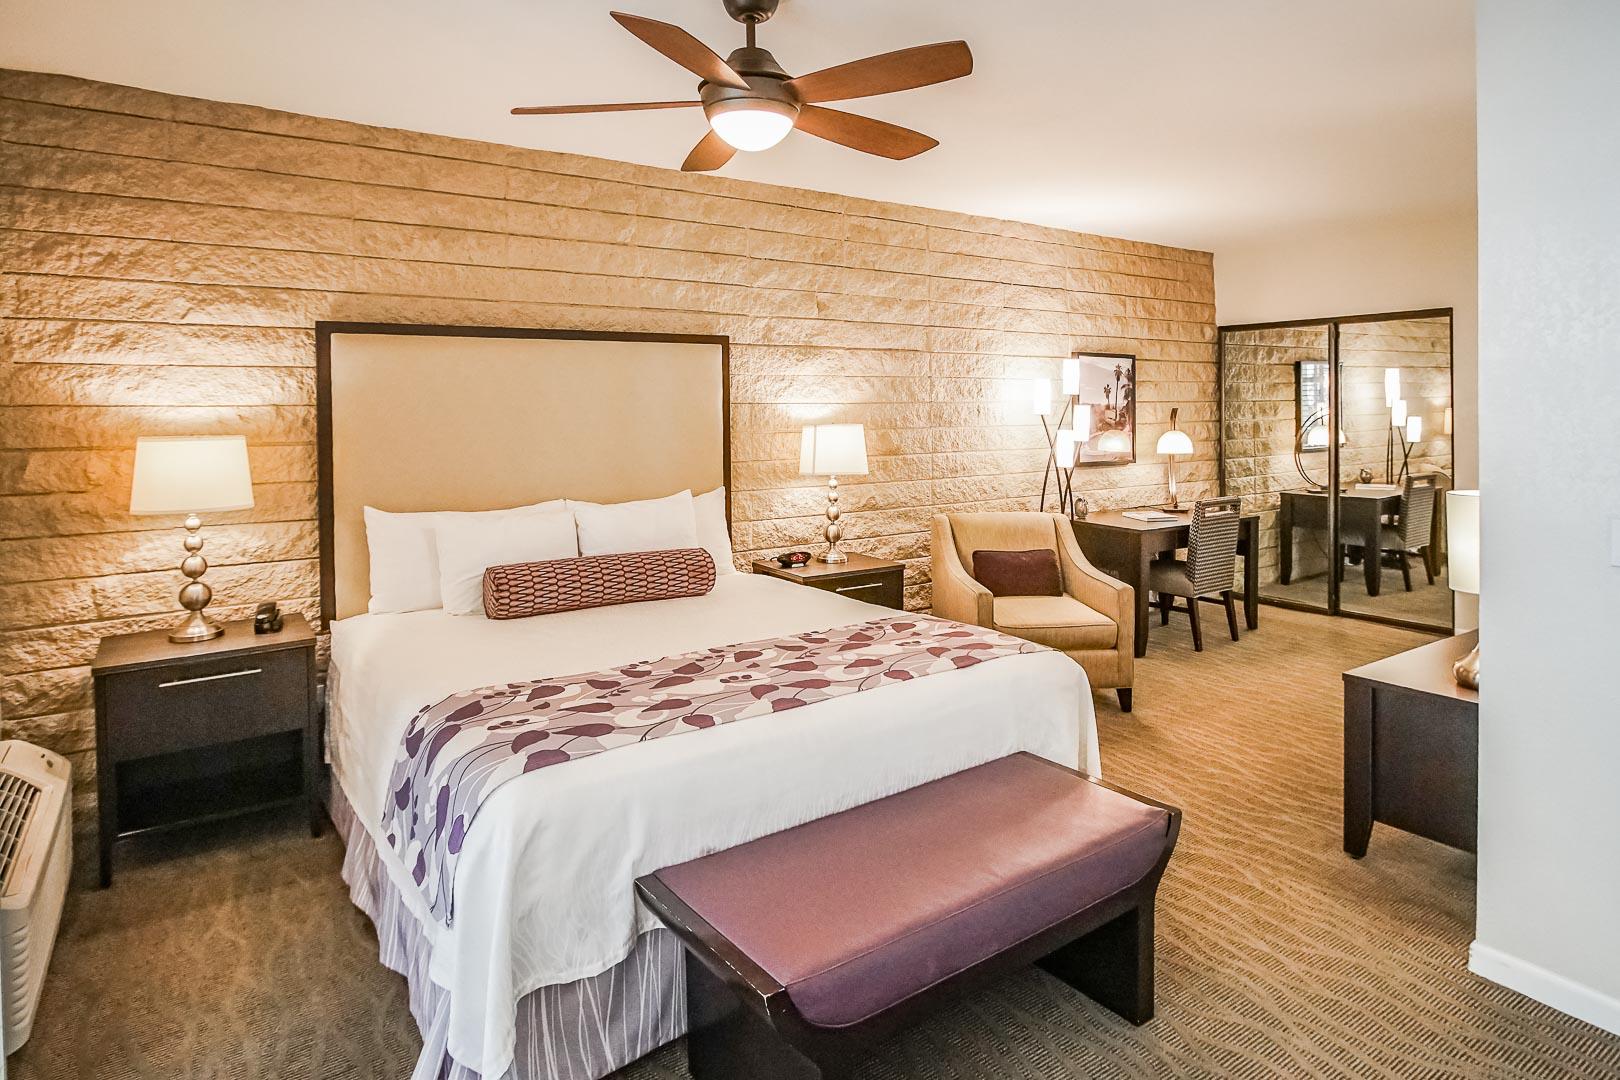 A modernized master bedroom at VRI's Palm Springs Tennis Club in California.